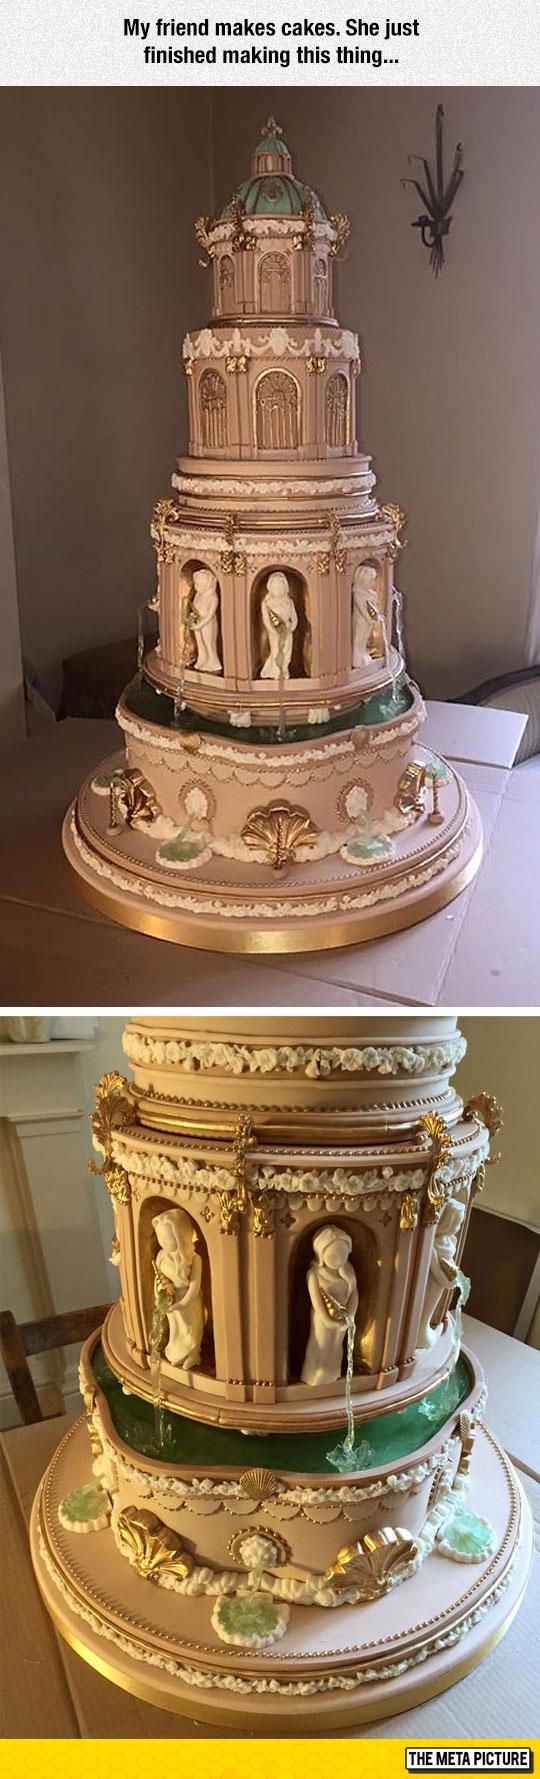 Pure Cake Epicness